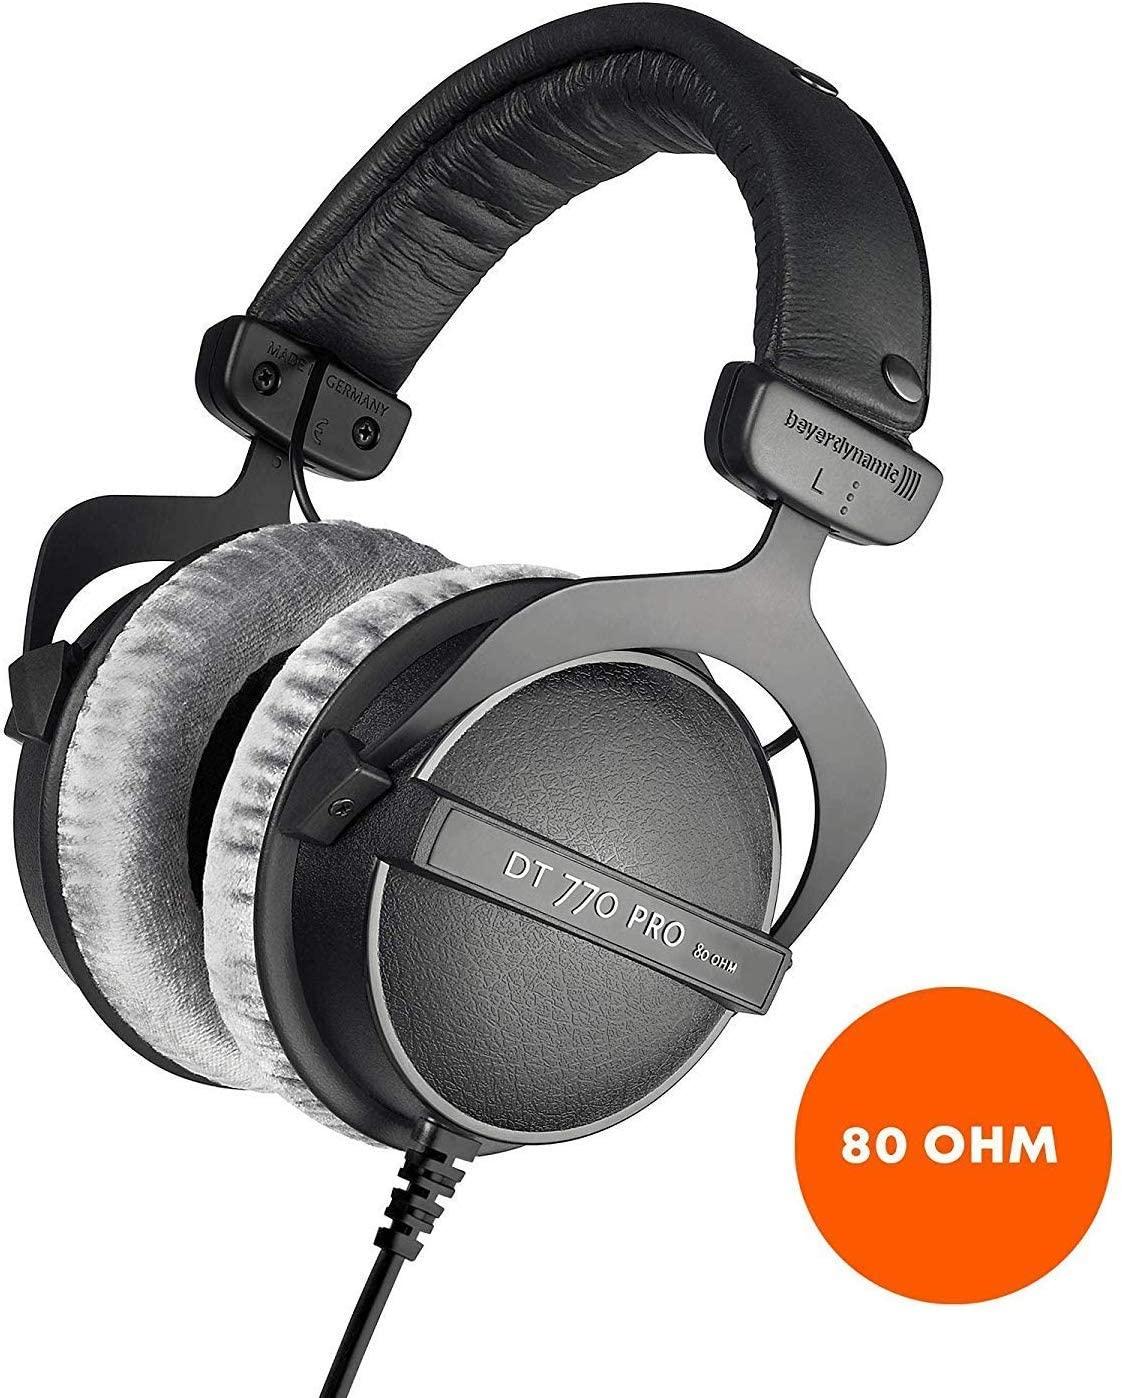 17% off Beyerdynamic DT 770 PRO Studio Headphones - £104.05 @ Amazon